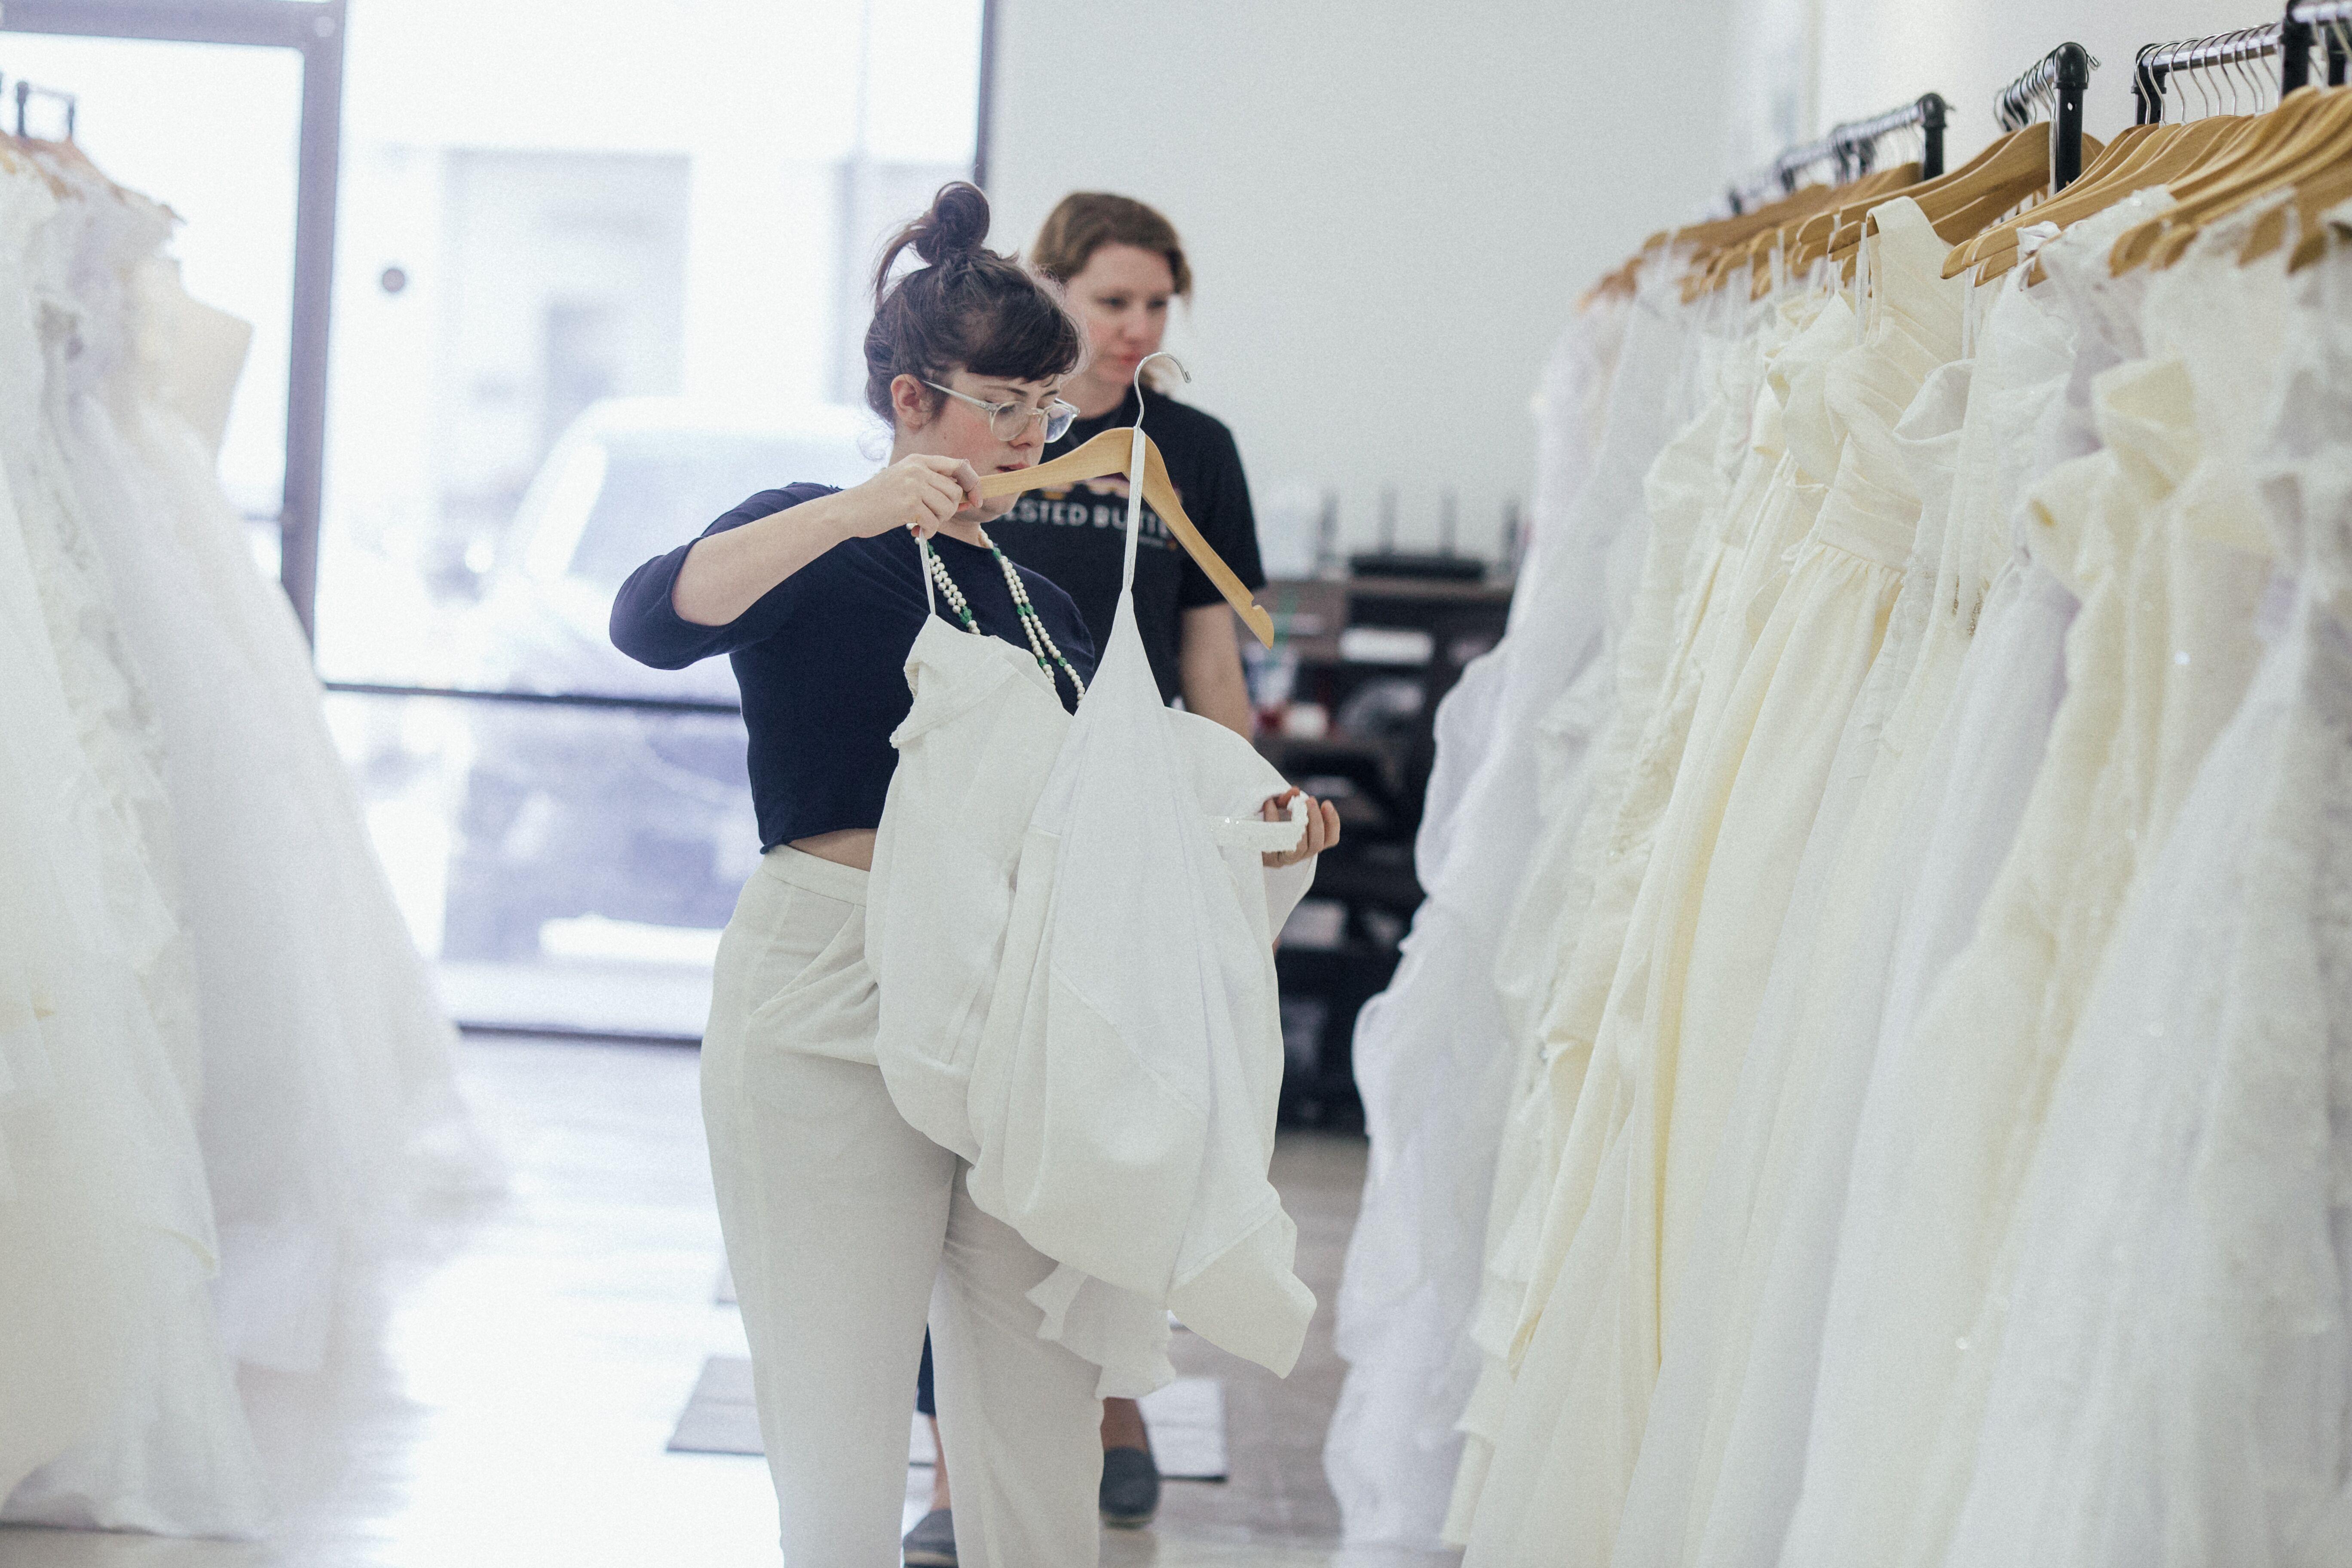 Bridal Salons In Costa Mesa CA